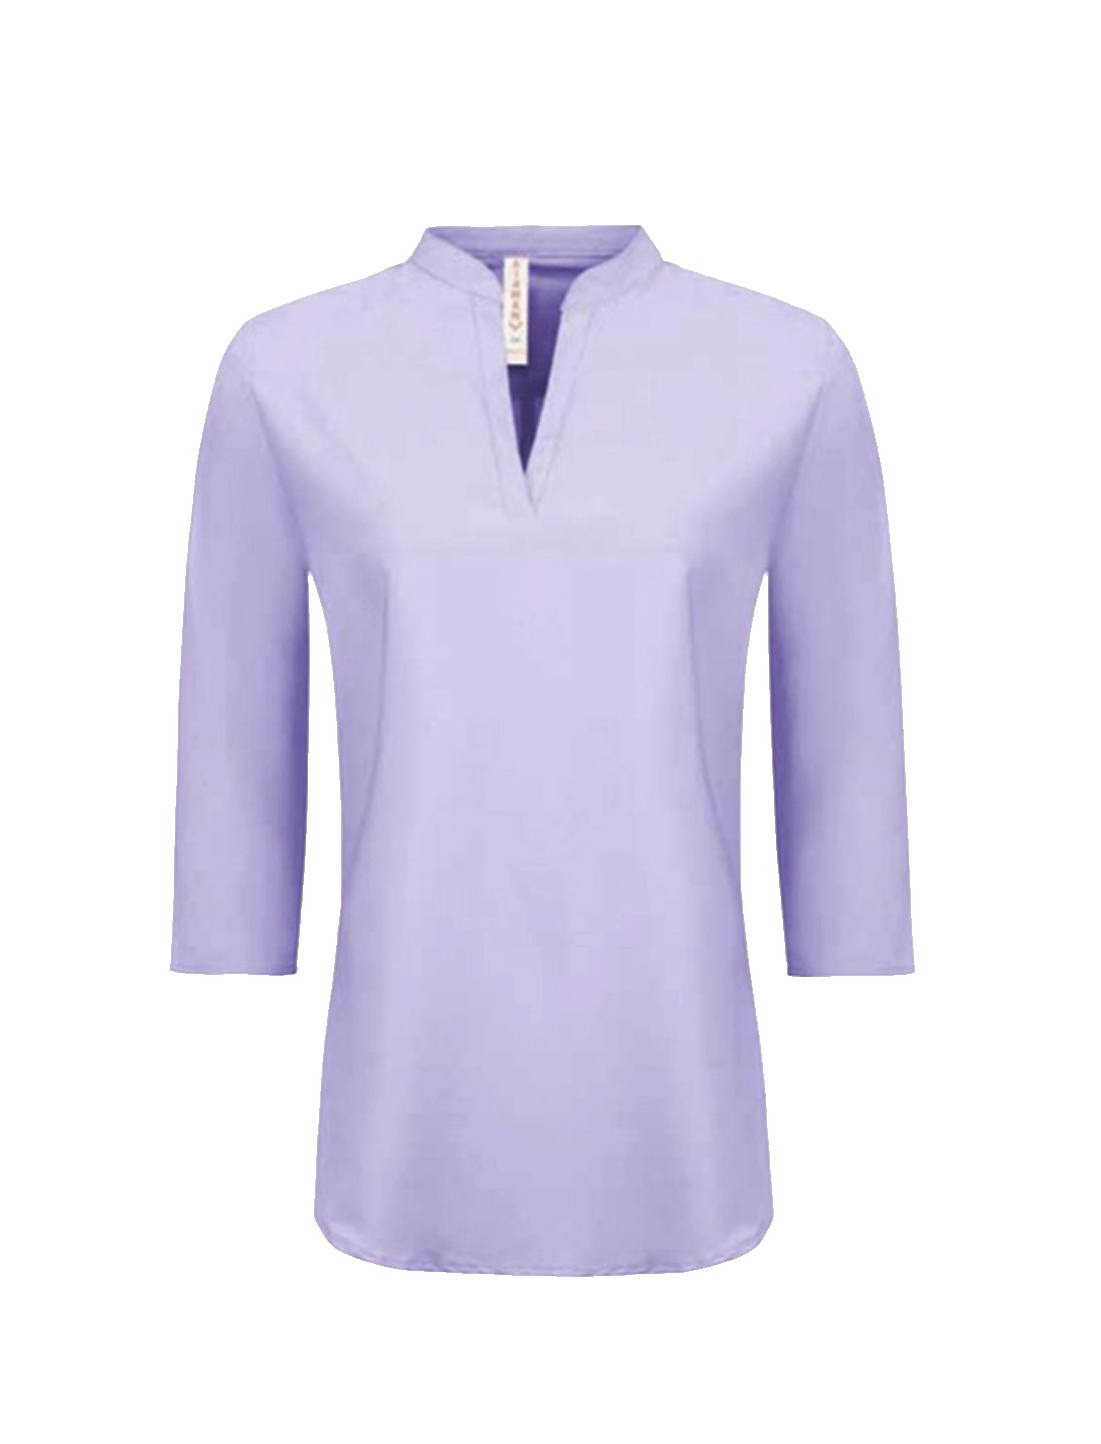 Blusa lightwear